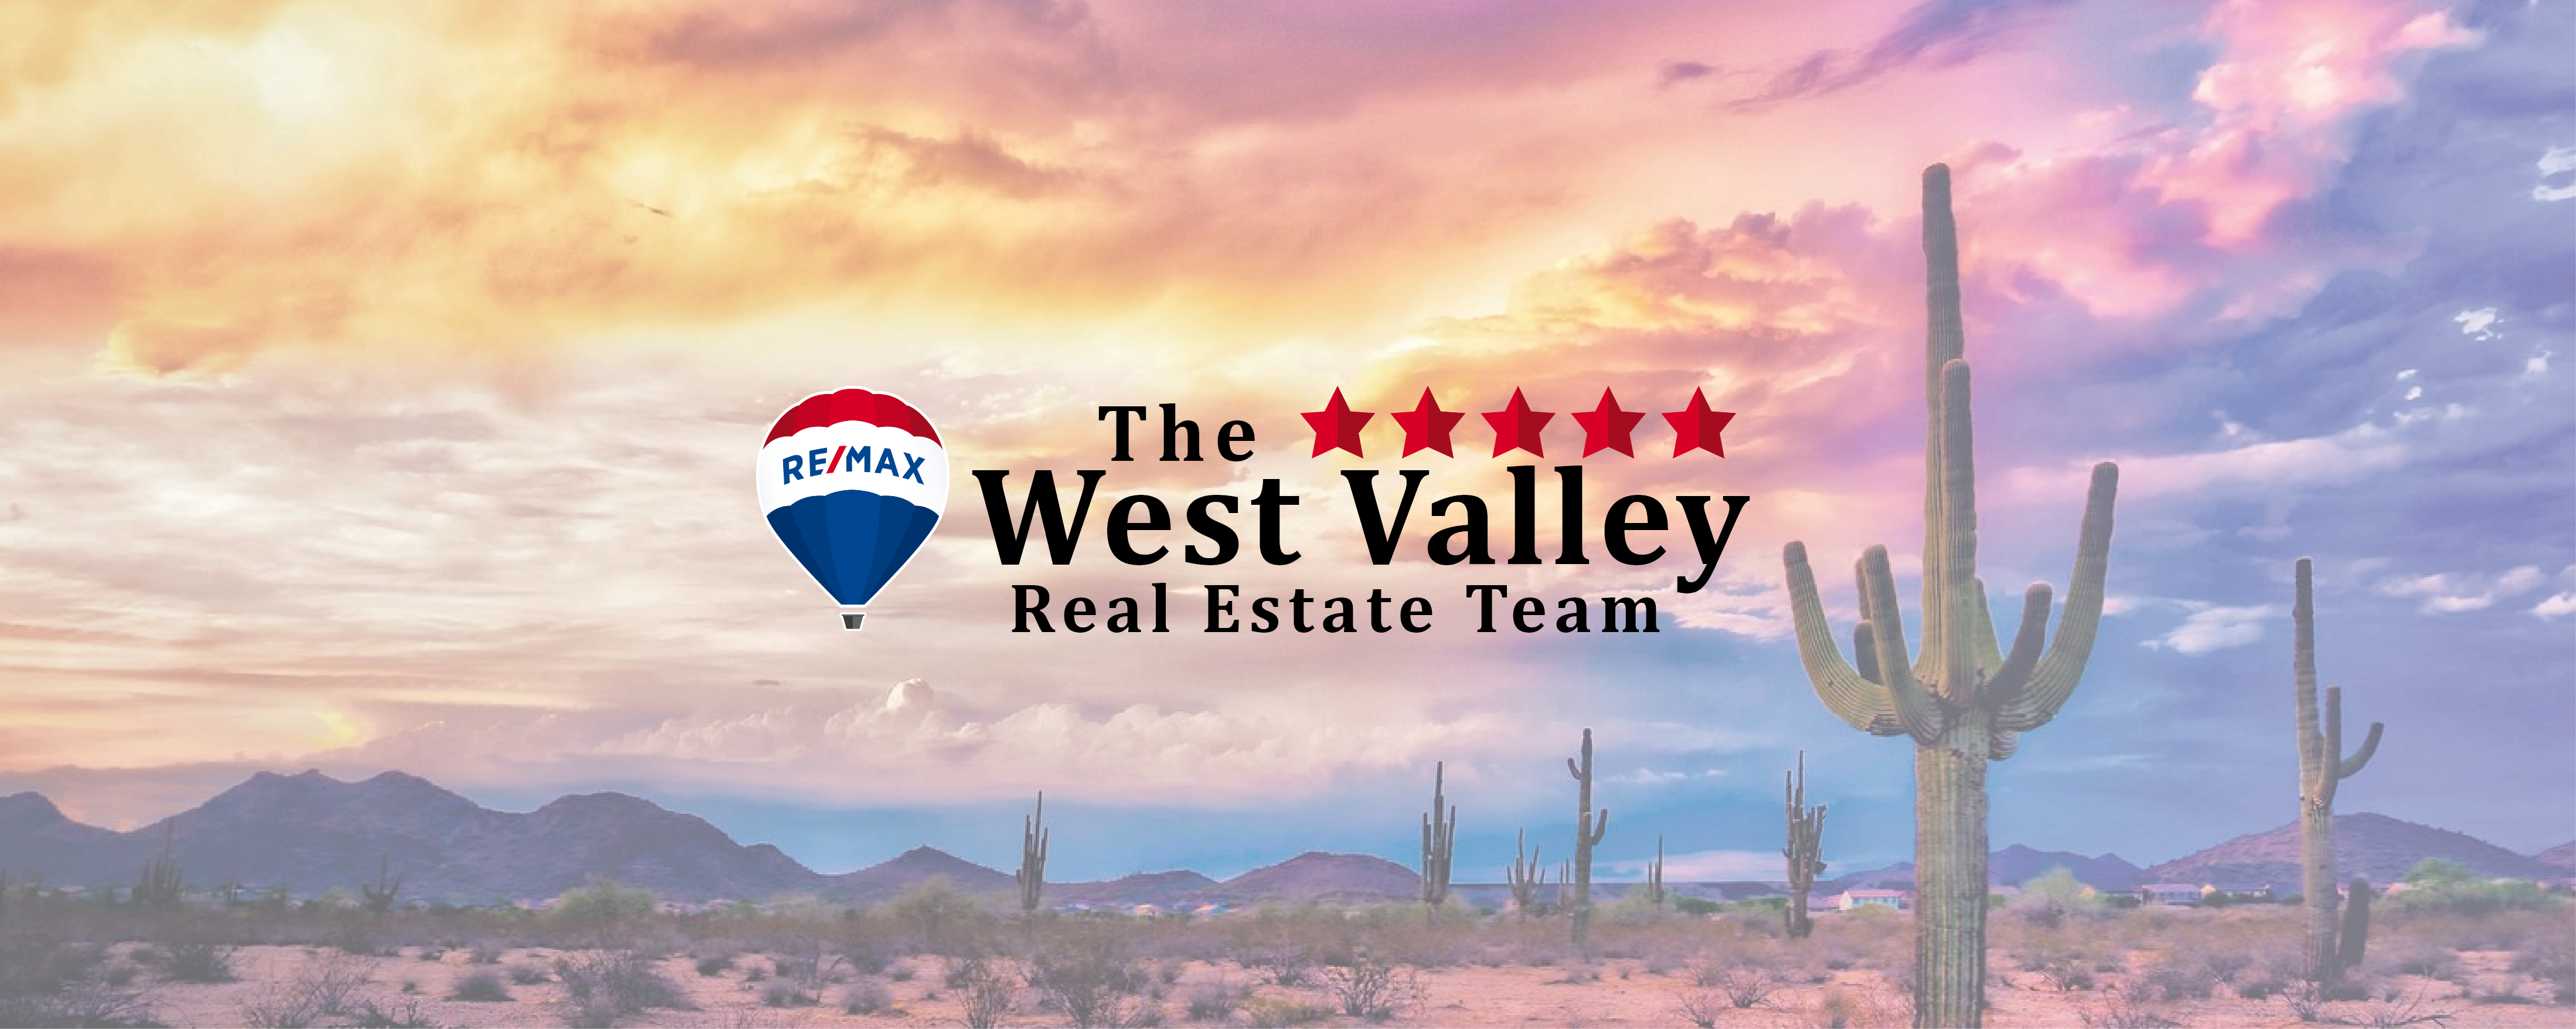 west-valley-real-estate-team-arizona